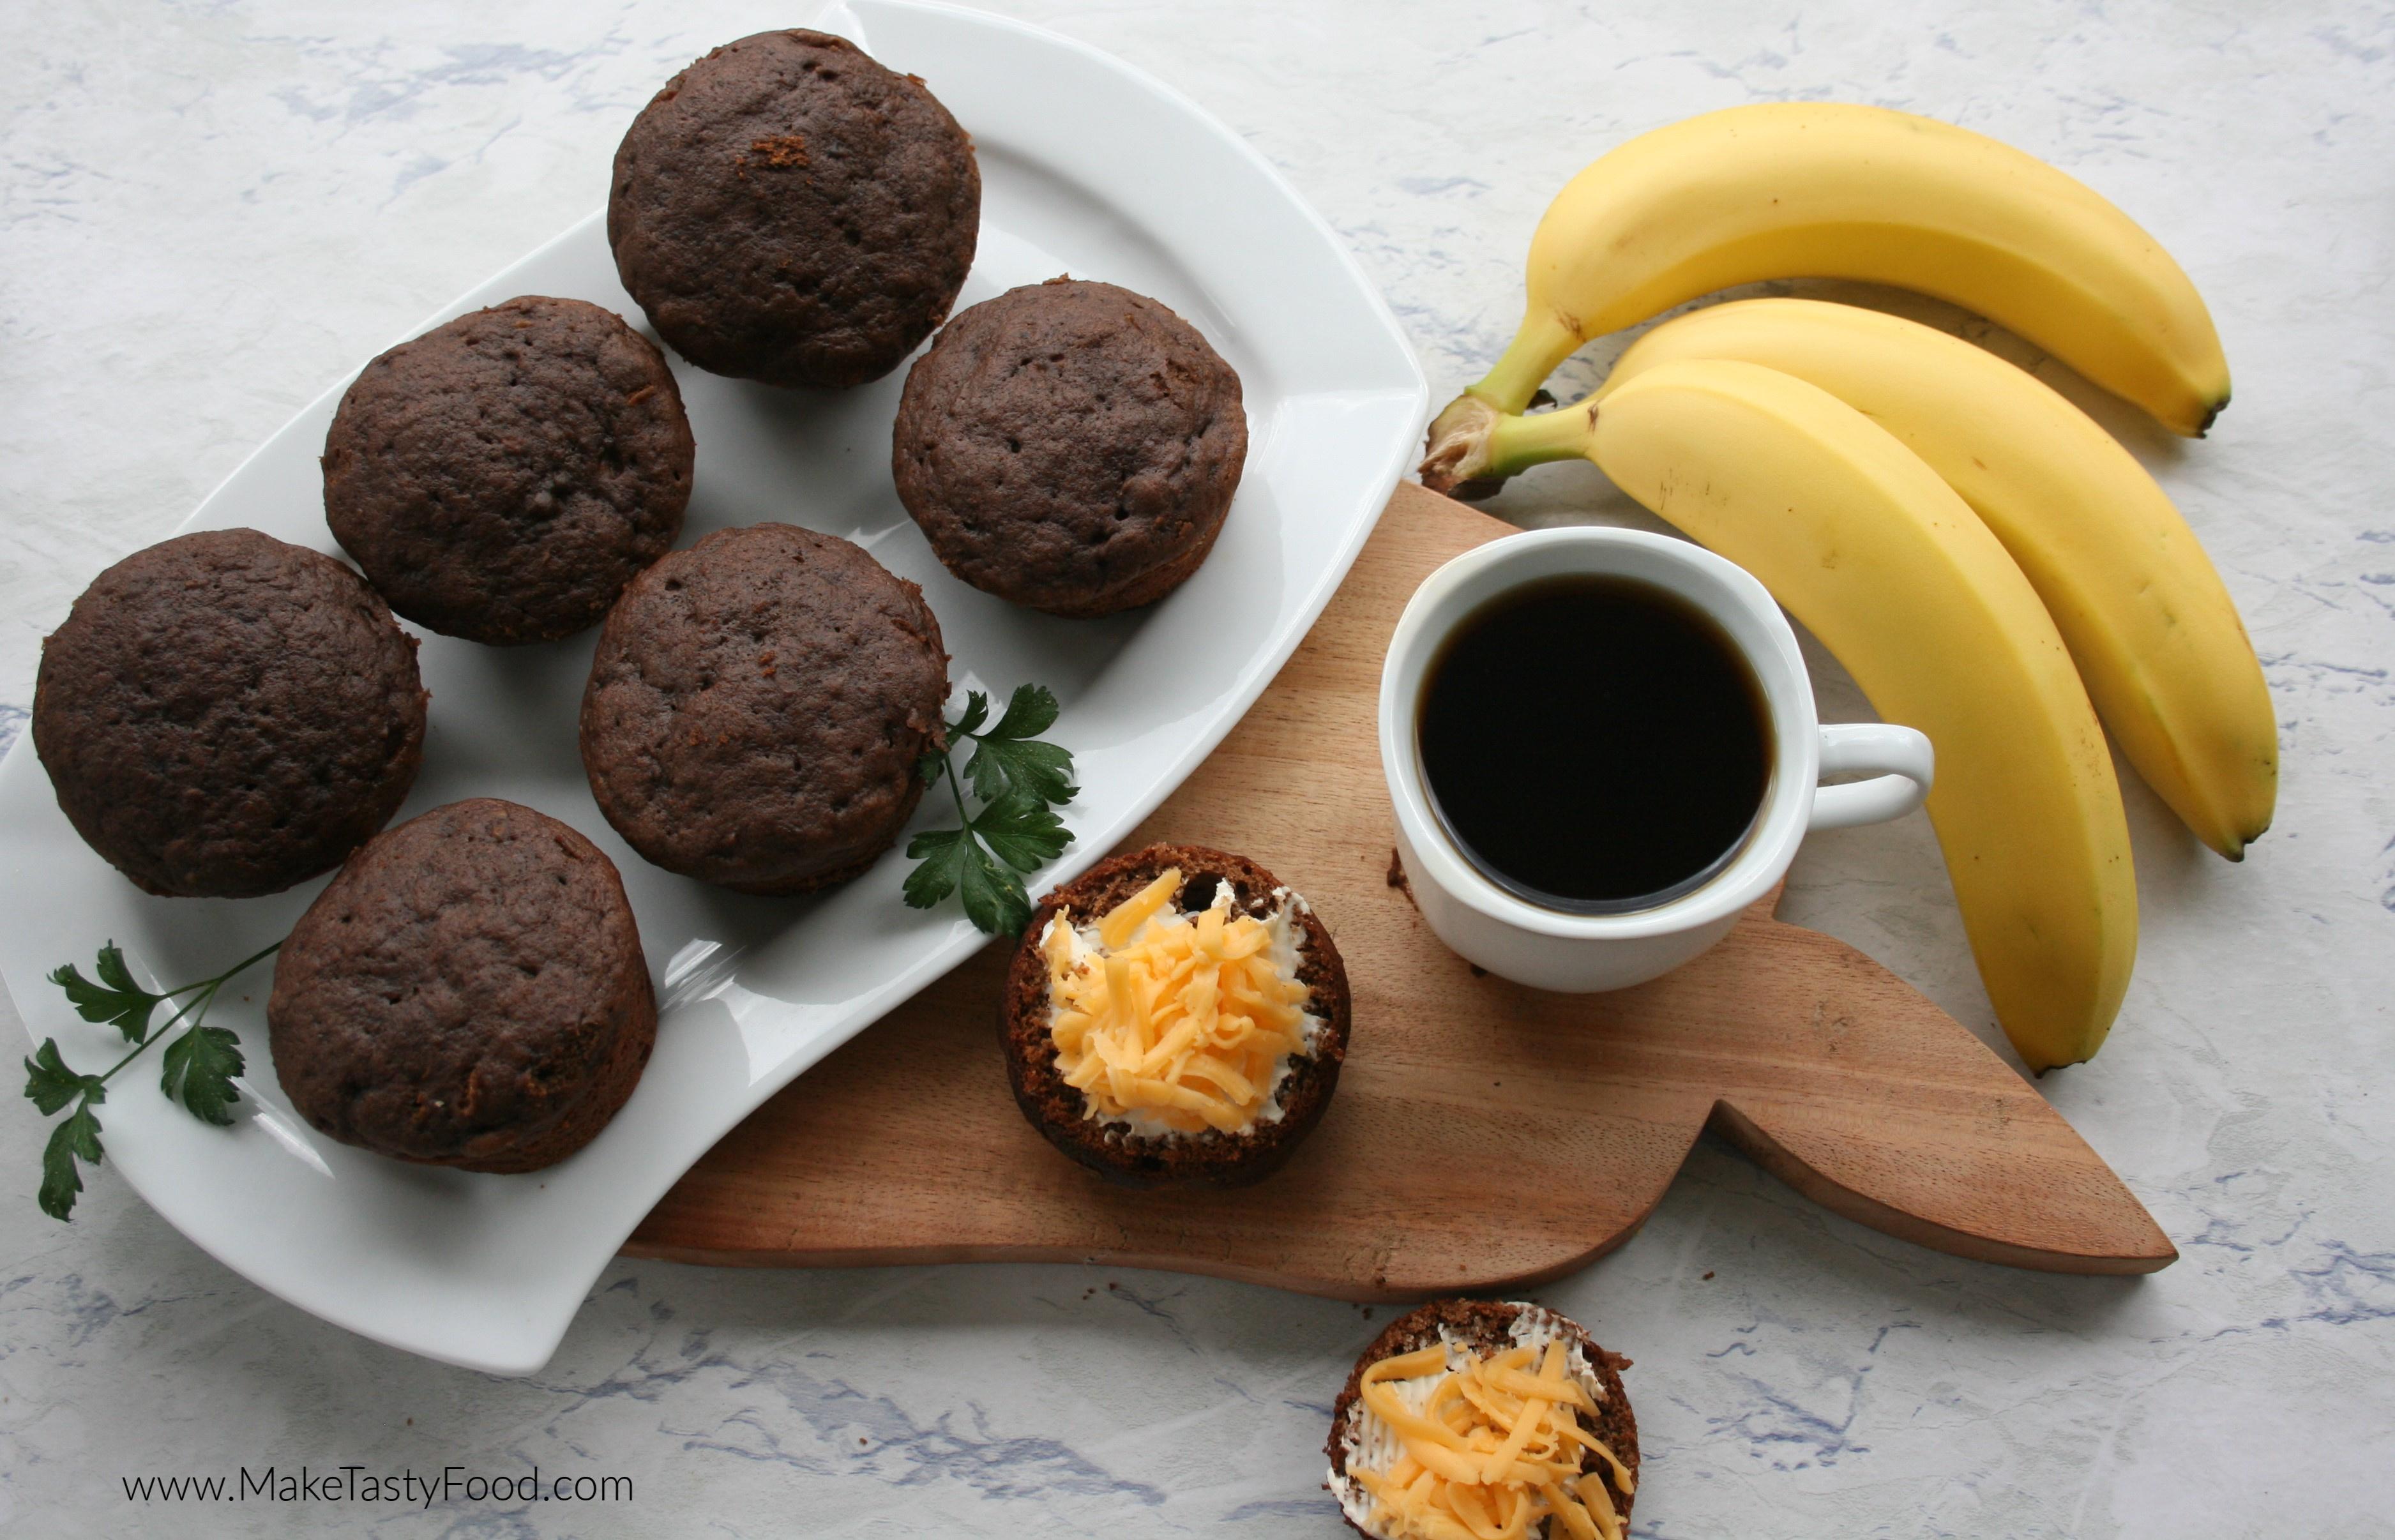 chocolate banana muffins served with coffee